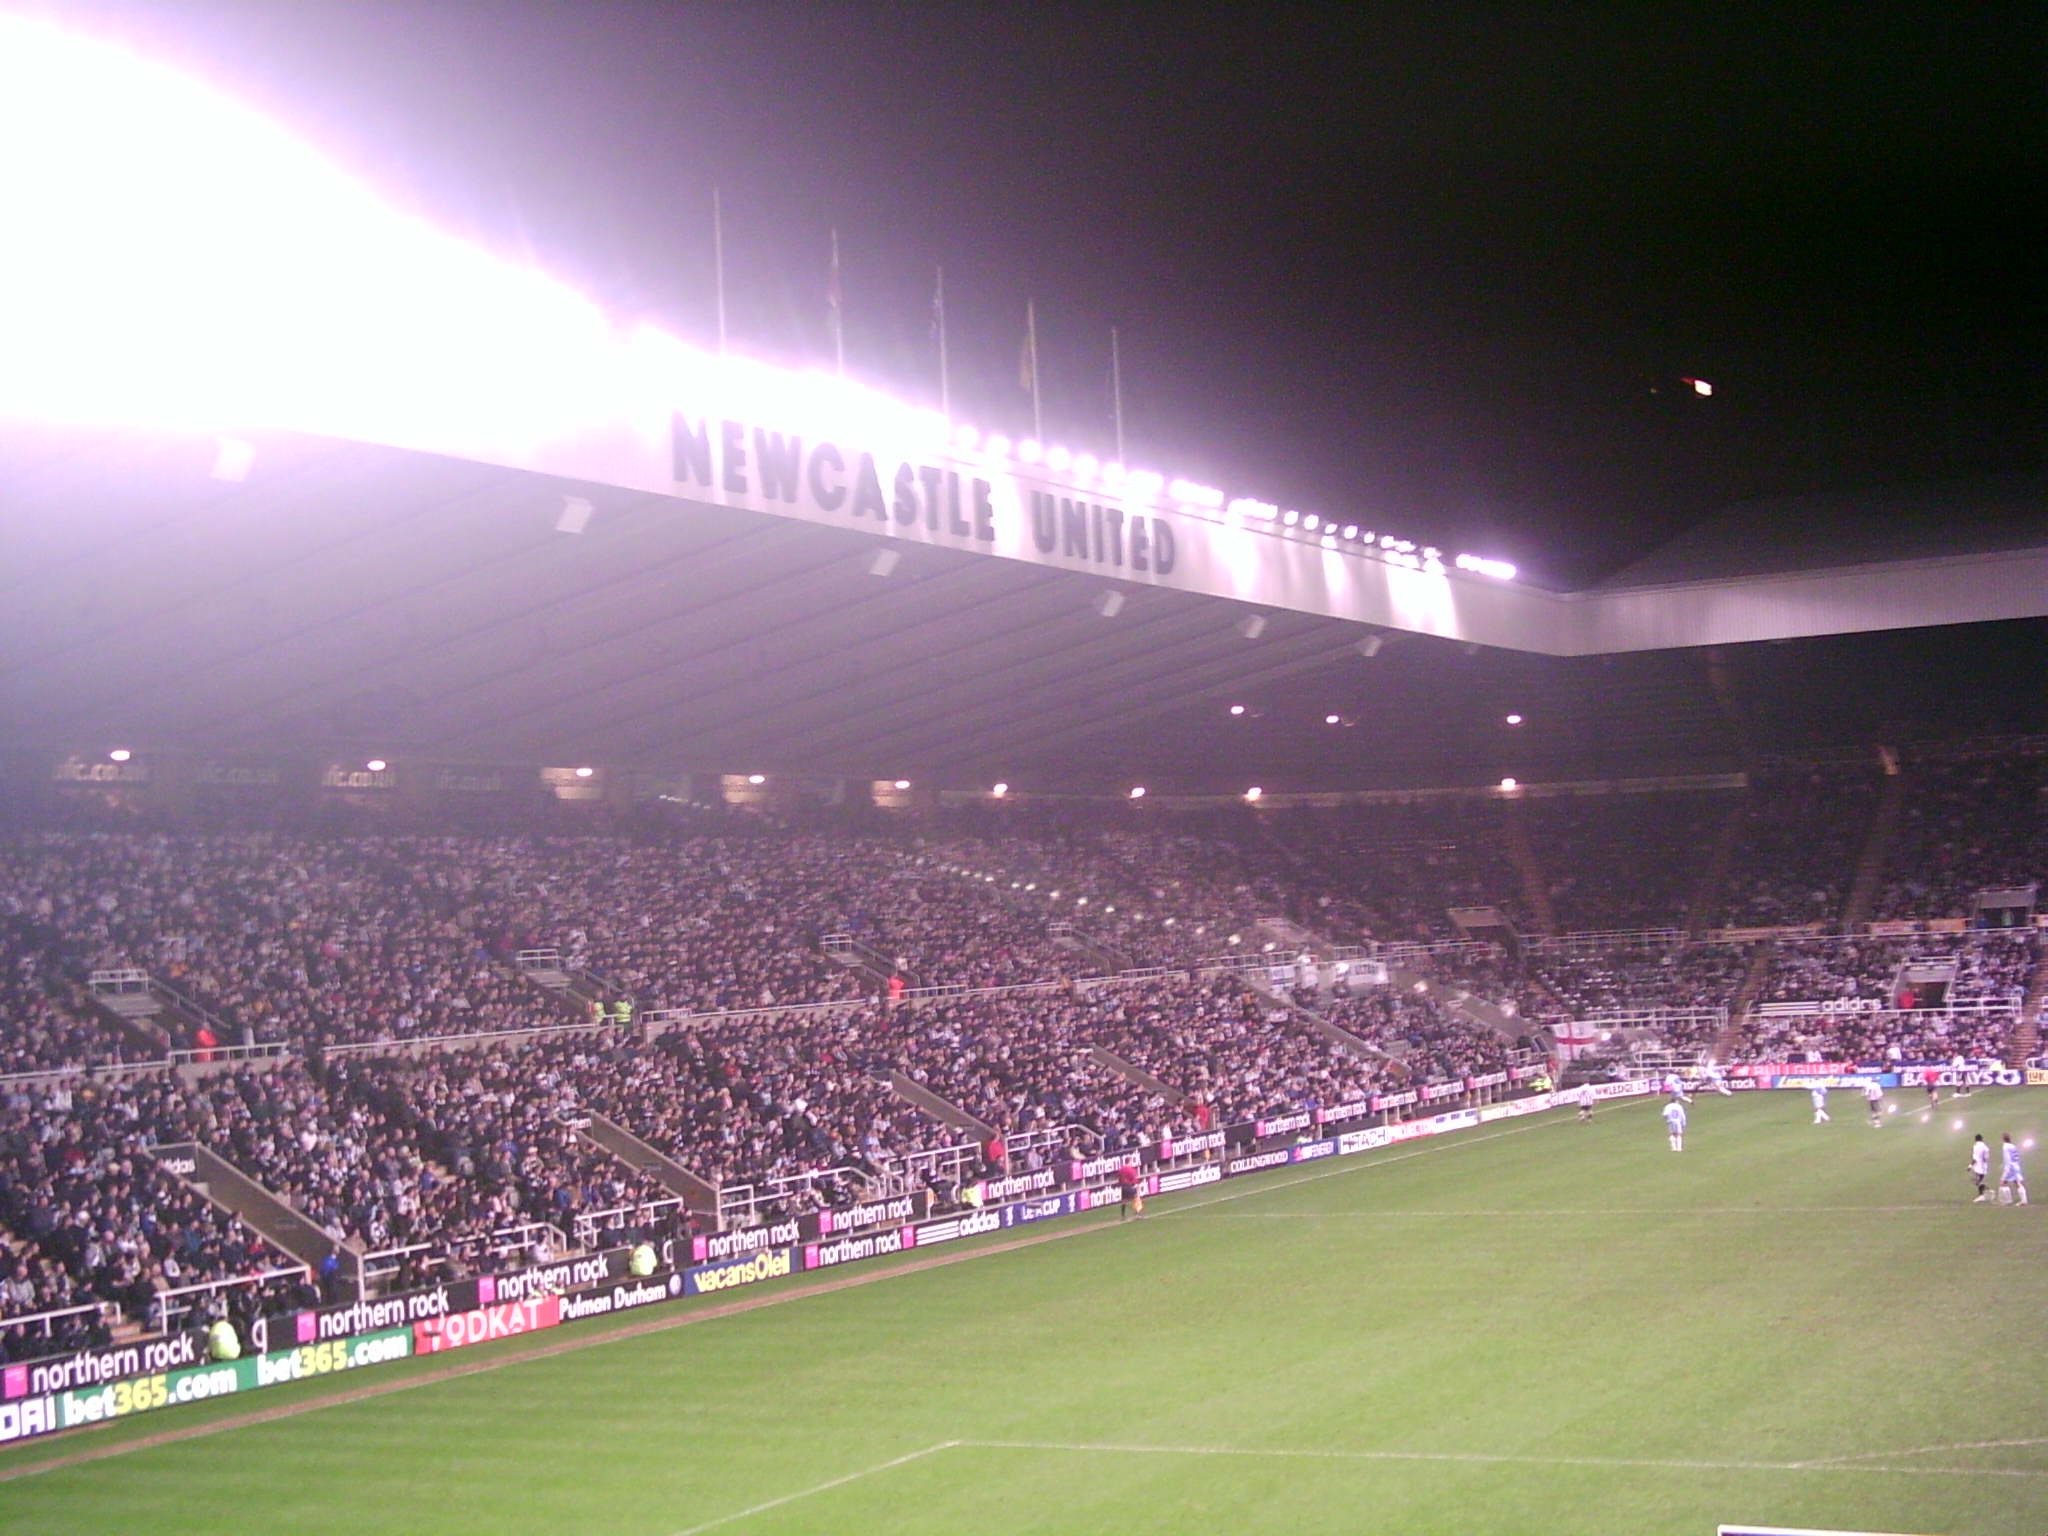 Newcastle_United_v_Zulte_Waragem,_2007_(2)-1